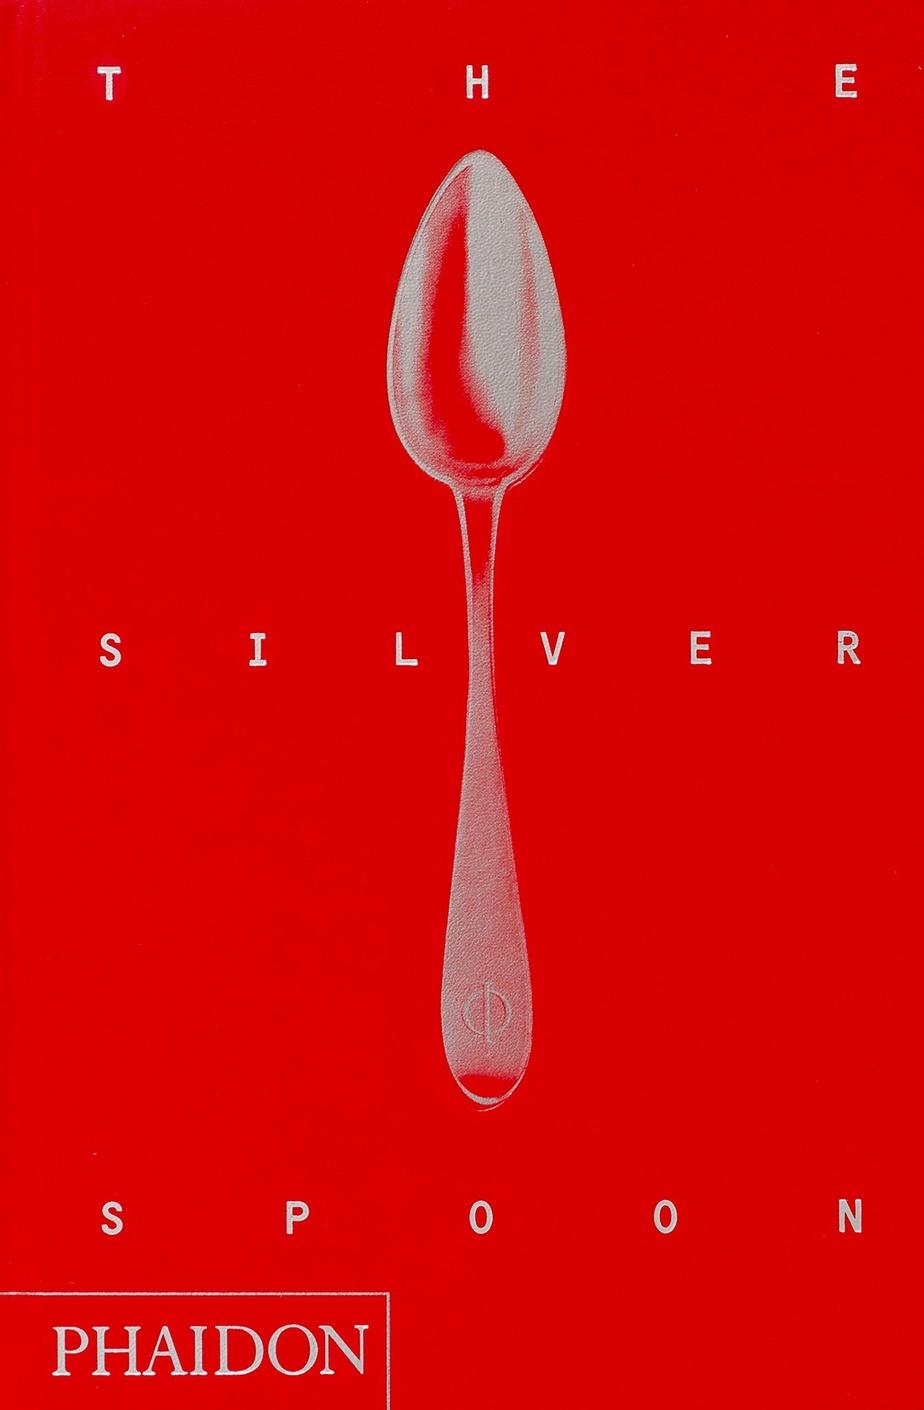 The Silver Spoon (Phaidon)